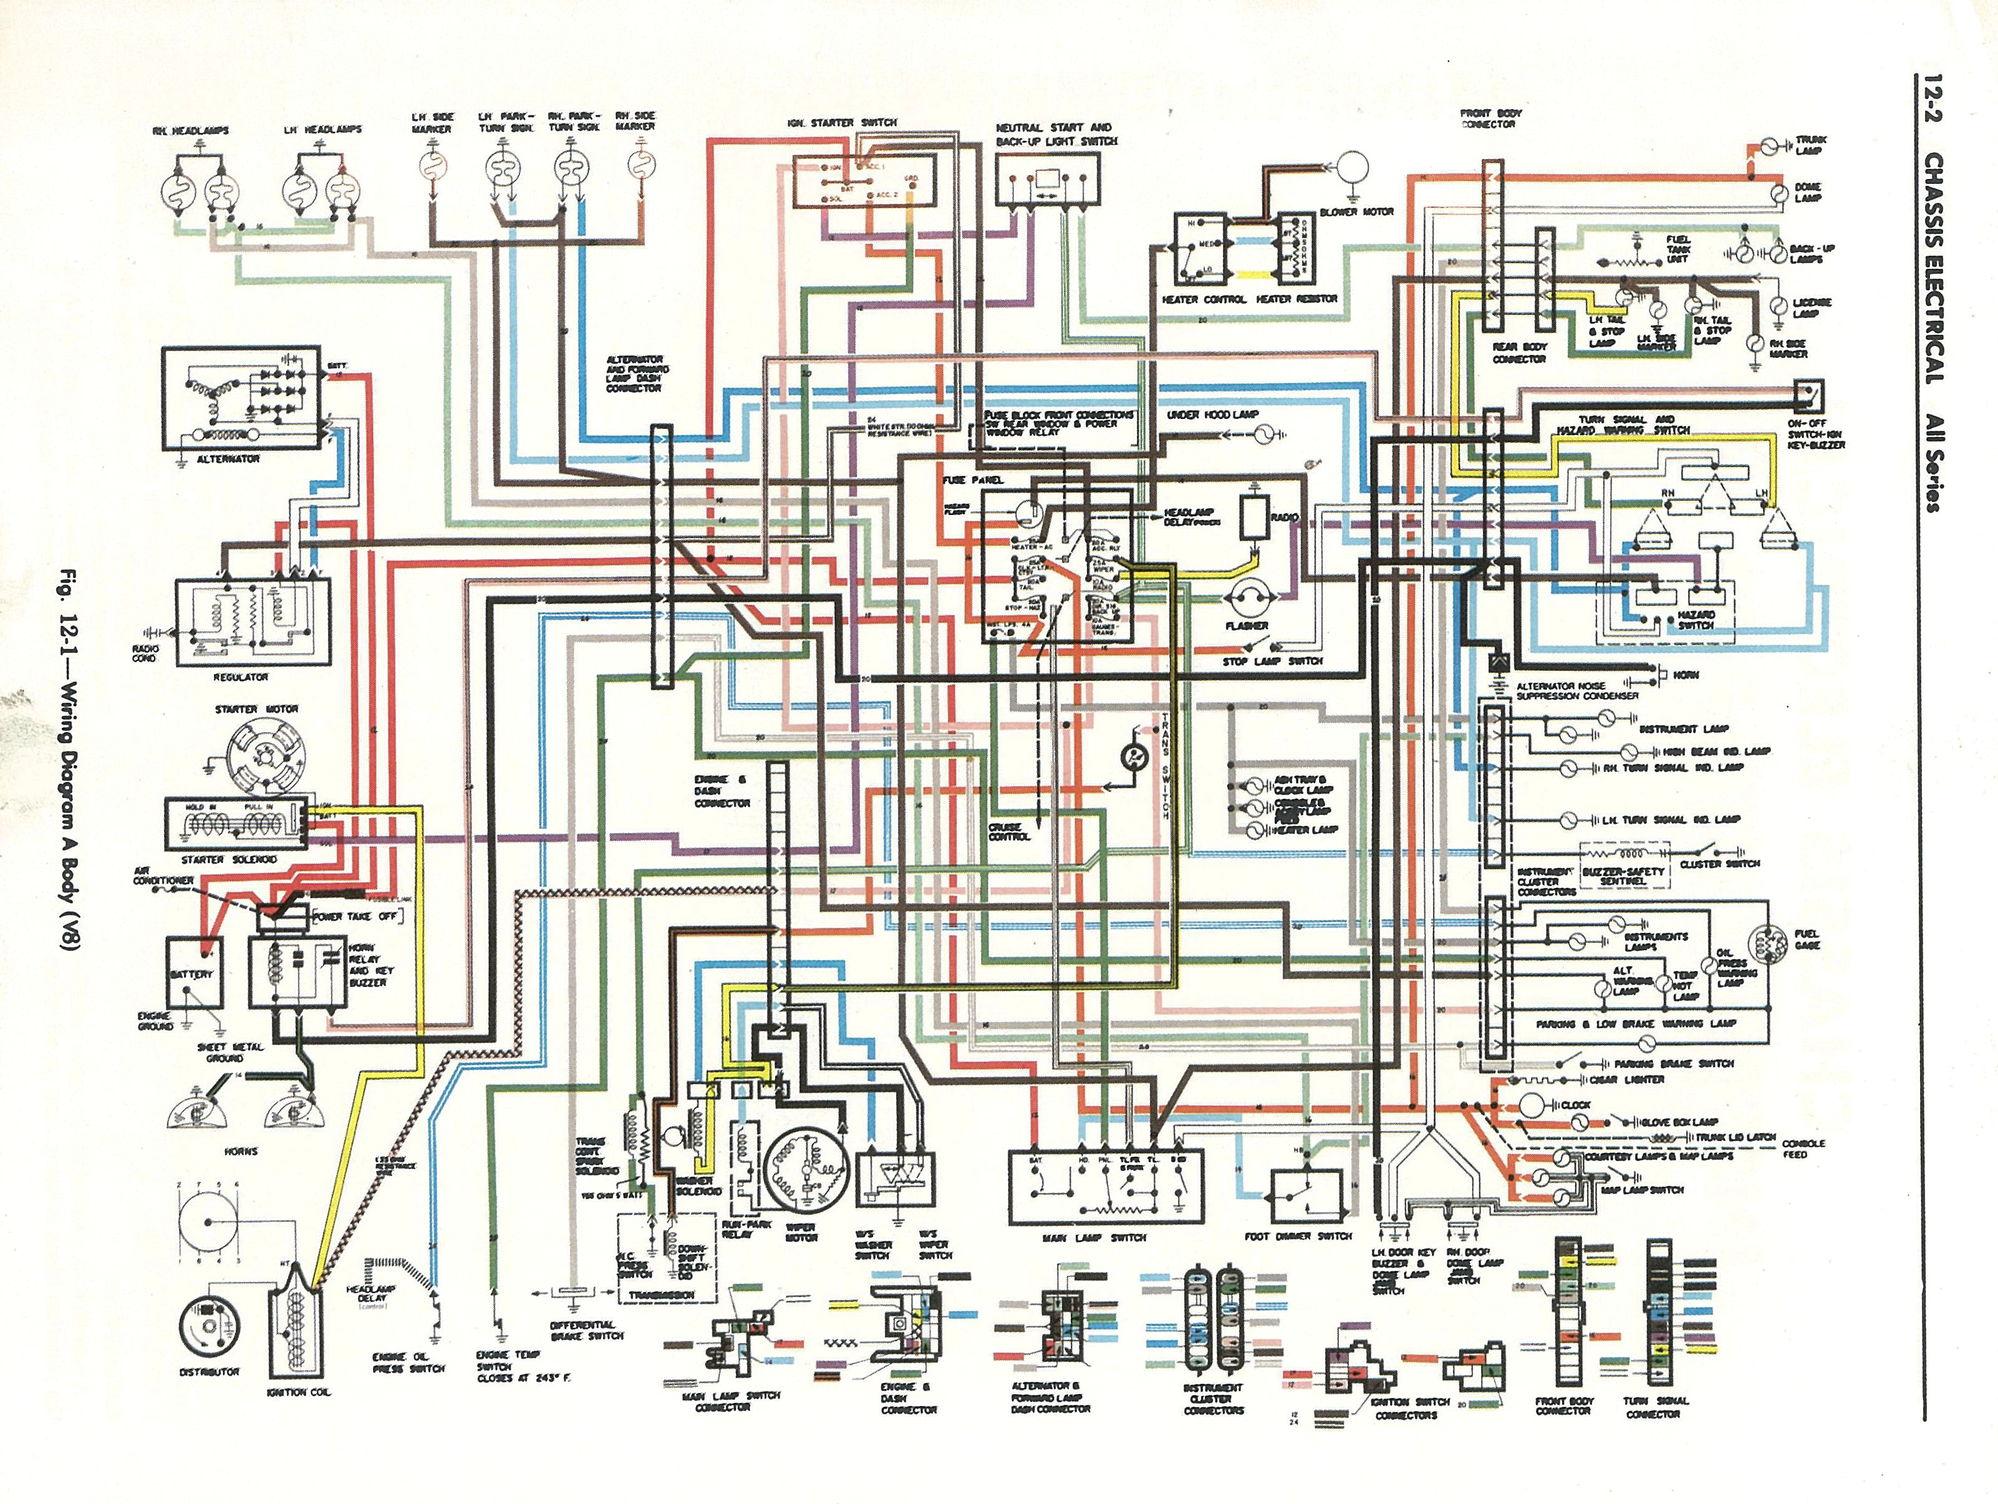 1967 oldsmobile cutlass wiring diagram